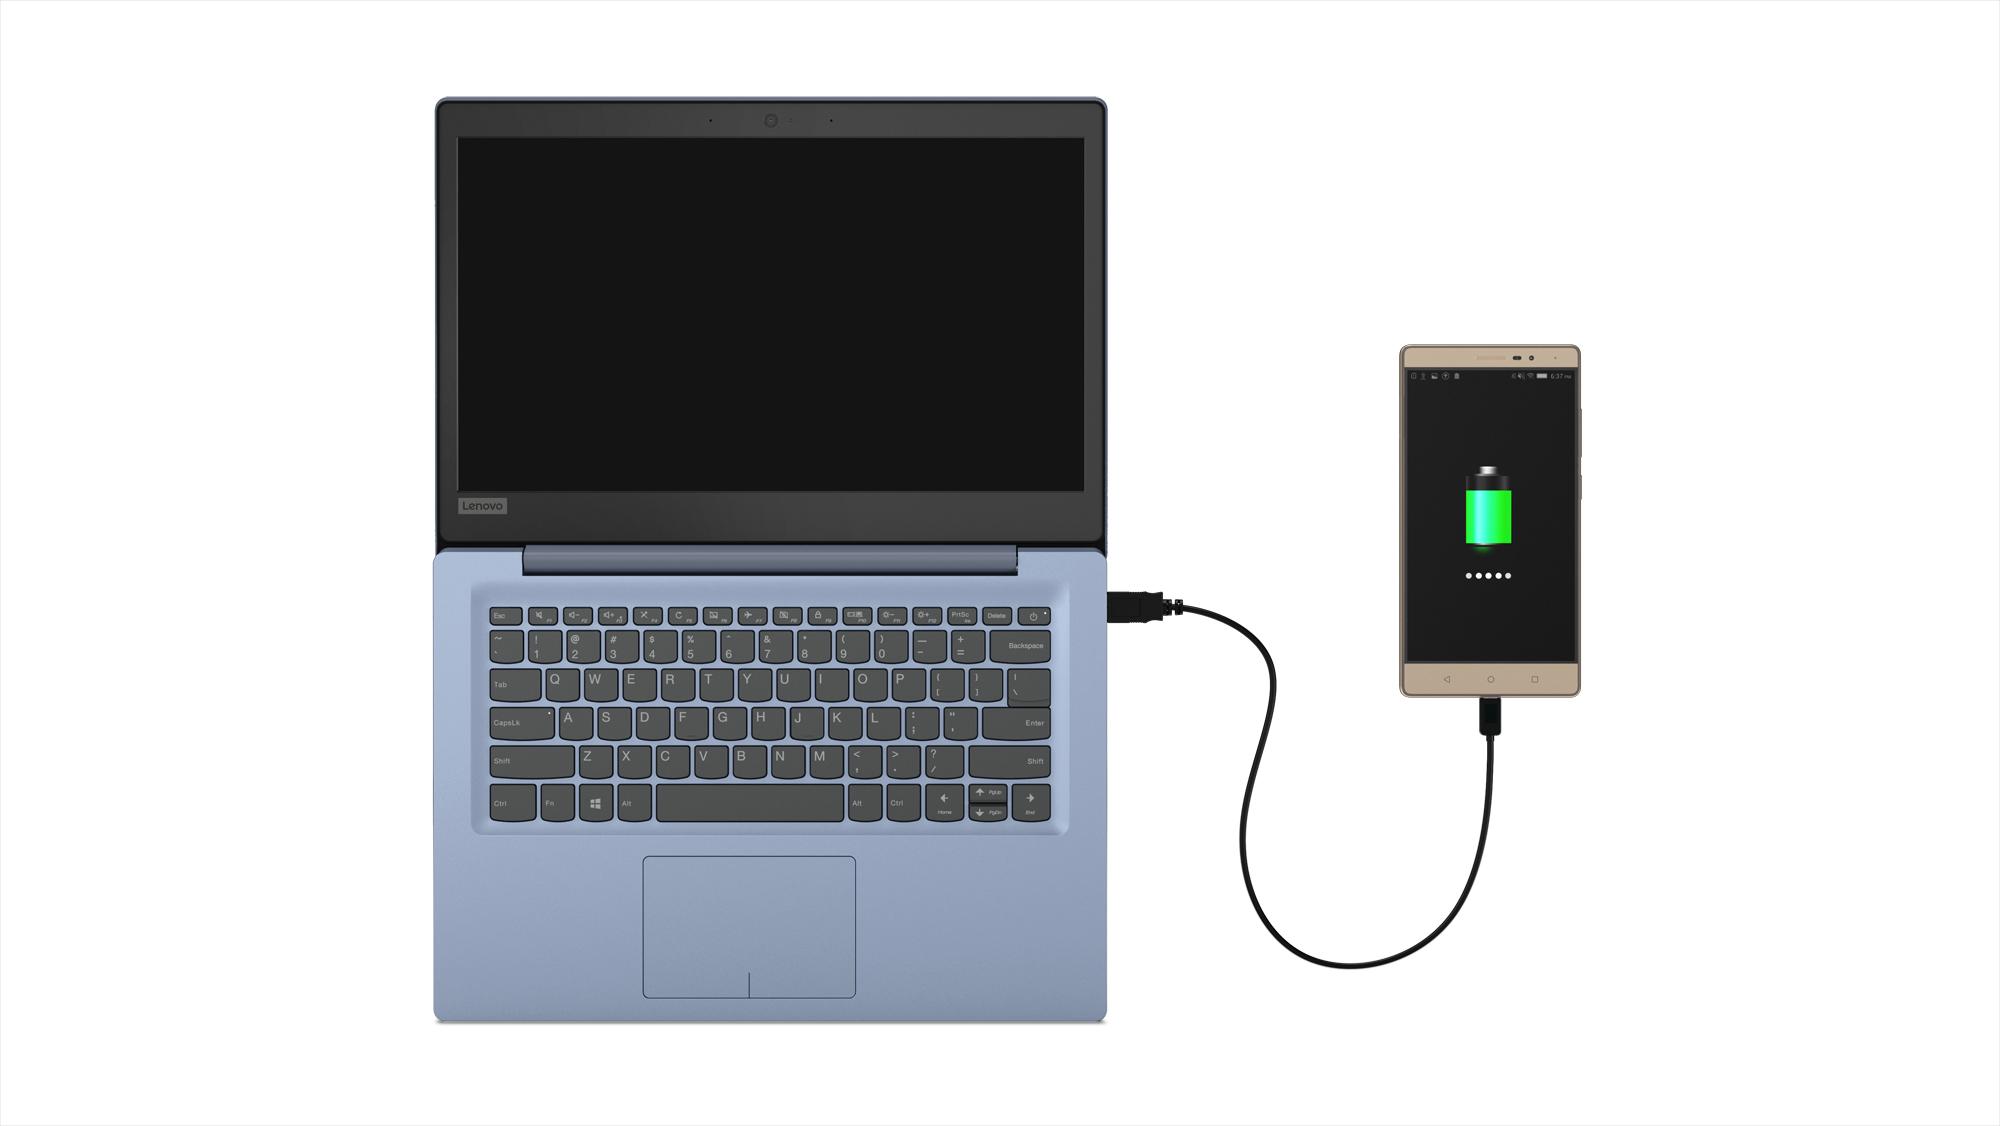 Фото  Ноутбук Lenovo ideapad 120S-11 Denim Blue (81A400DARA)